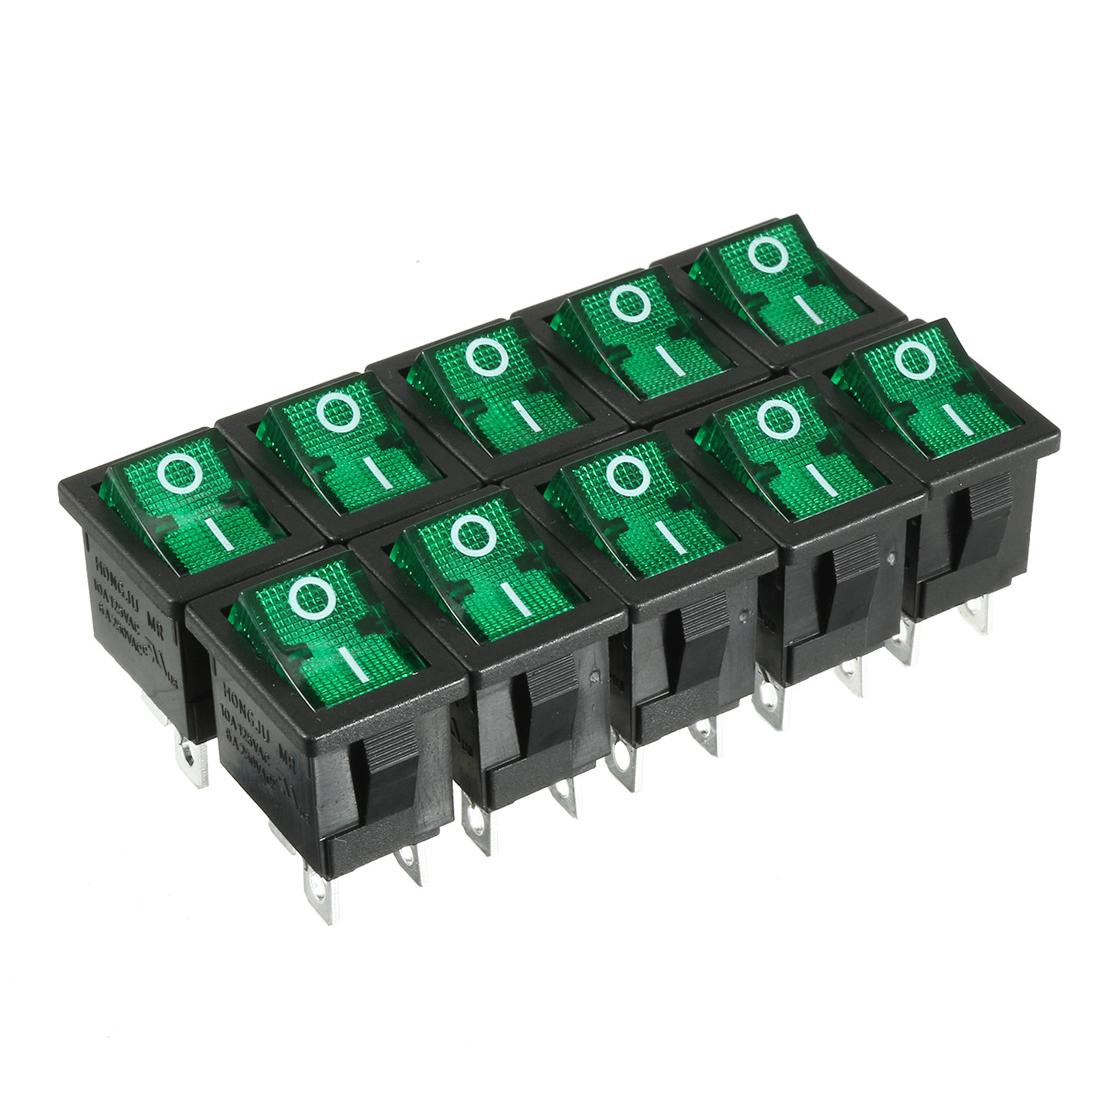 10pcs AC 250V/6A 125V/10A DPST Rocker Switch Latching Green Button